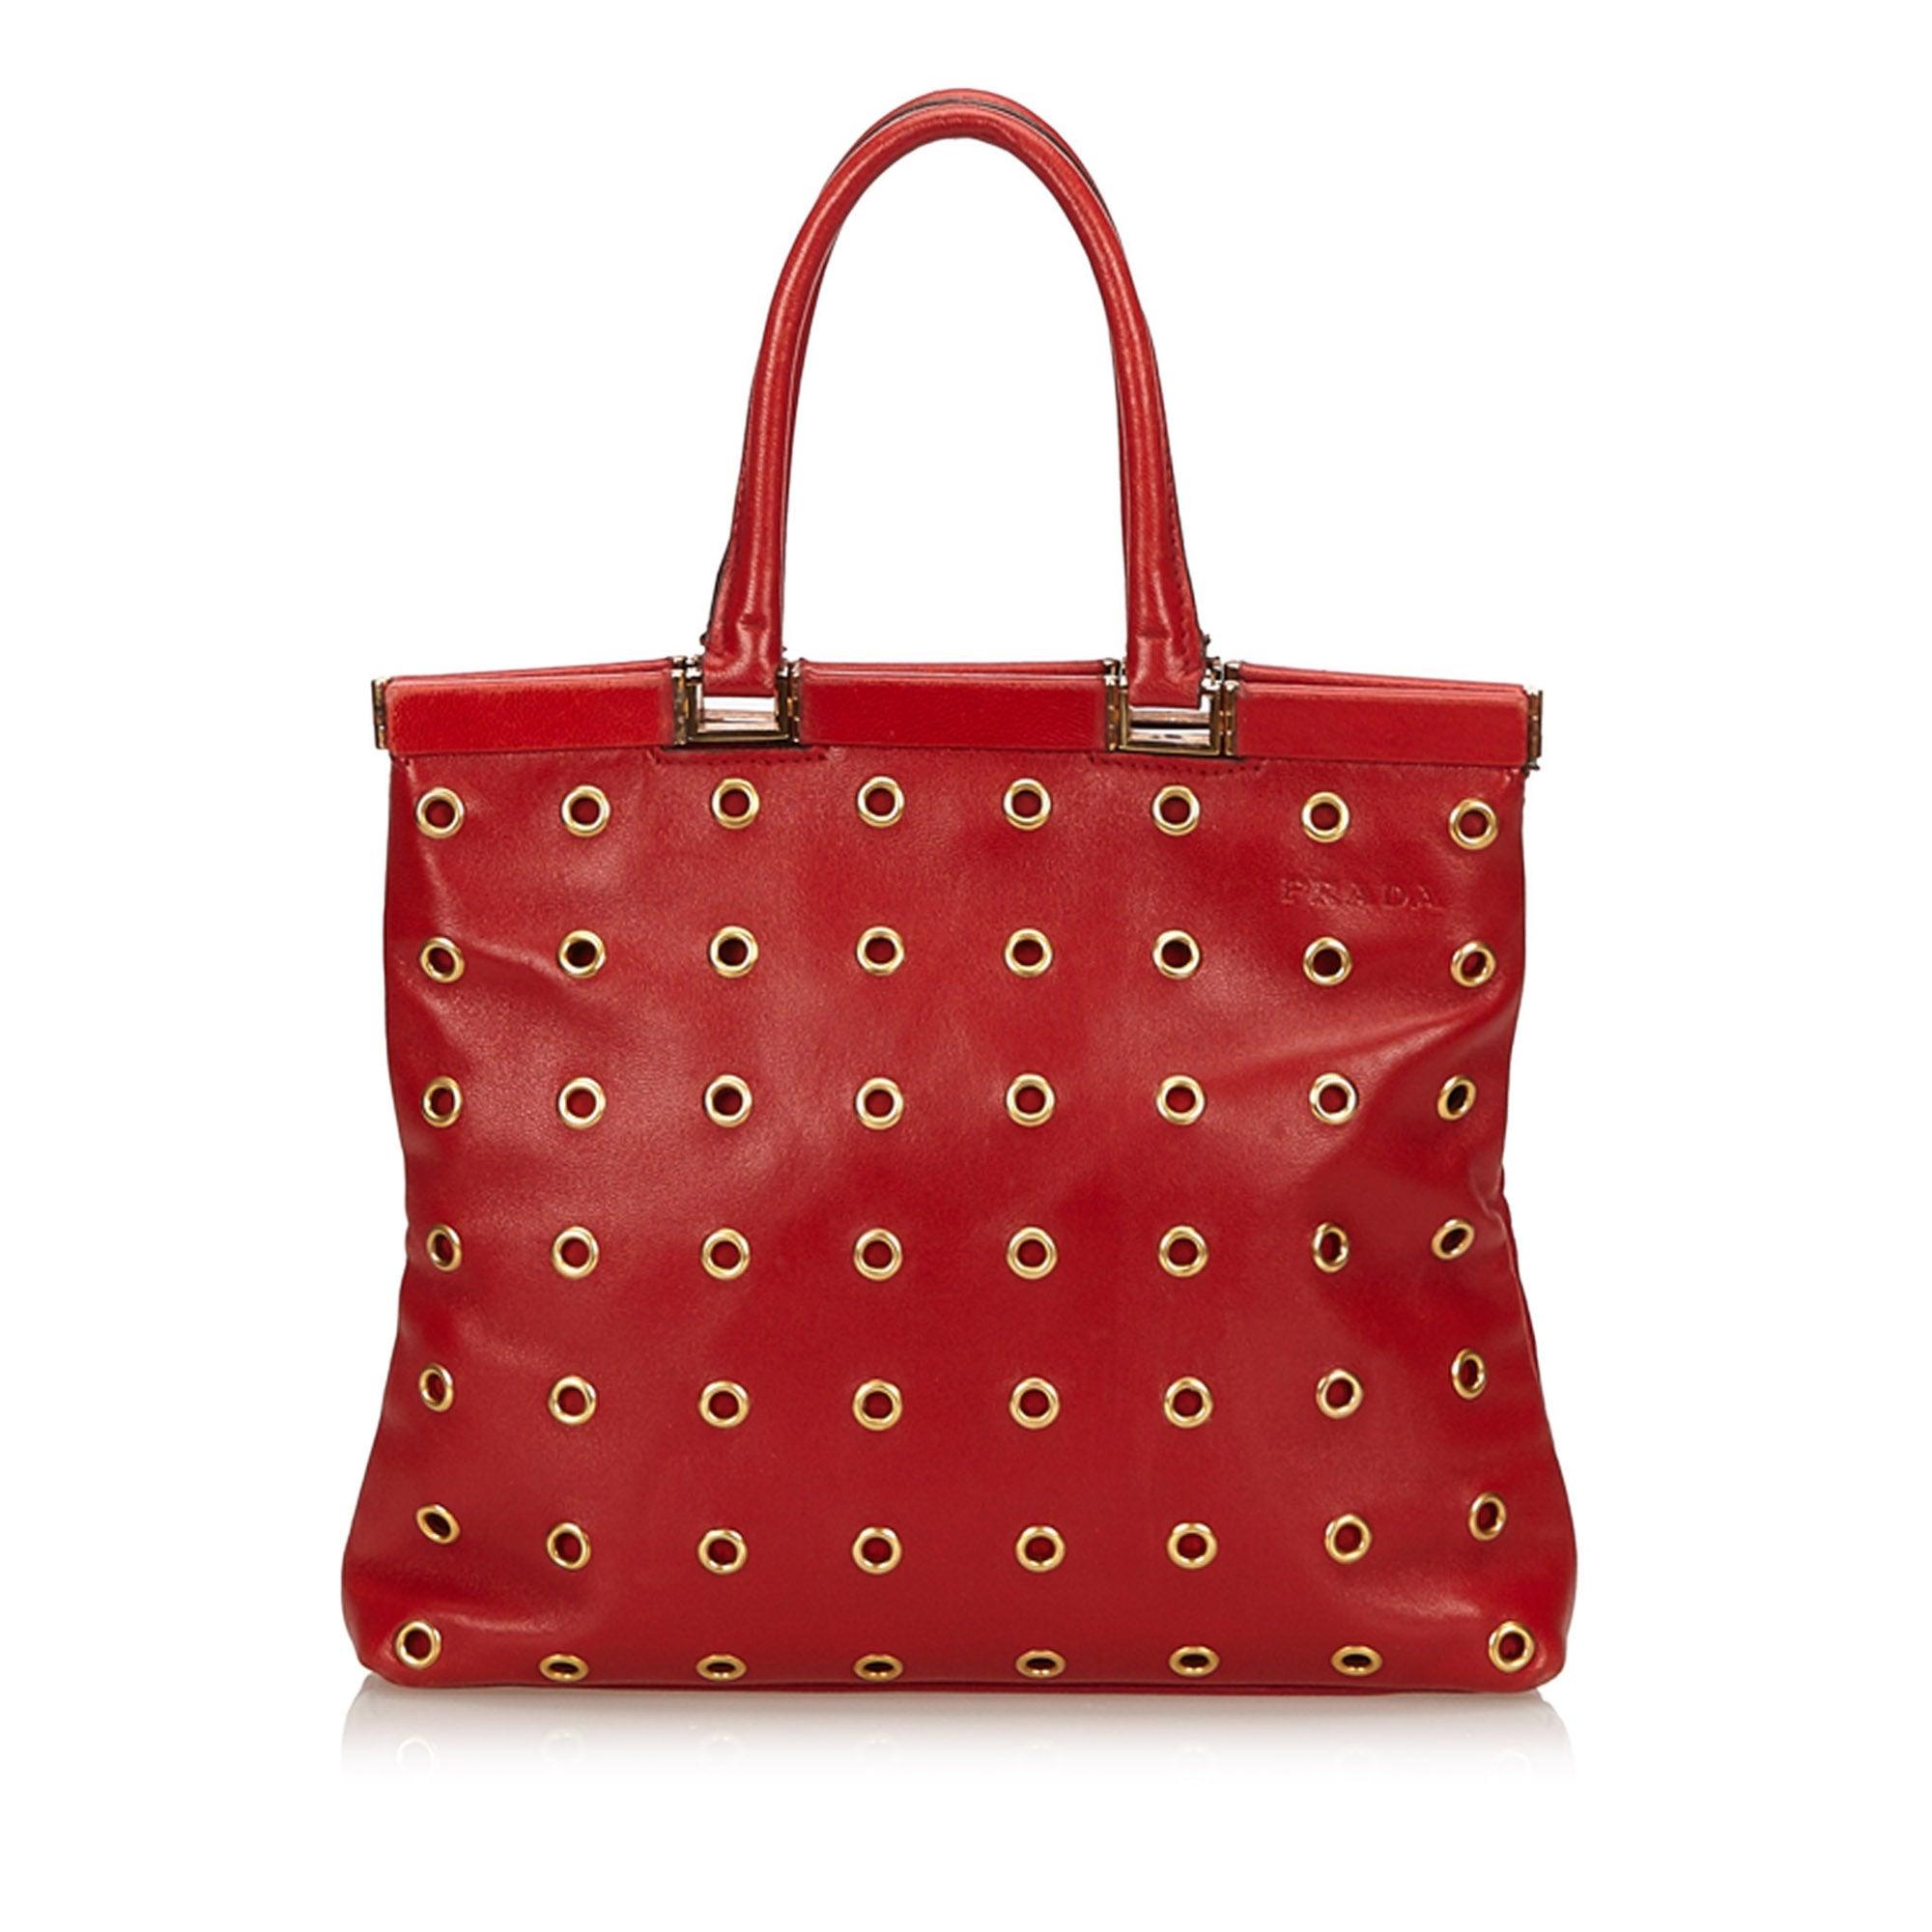 3cd42e5bd050 ... top quality prada red calf leather 18 carat gold toned eyelet handbag  for sale at 1stdibs